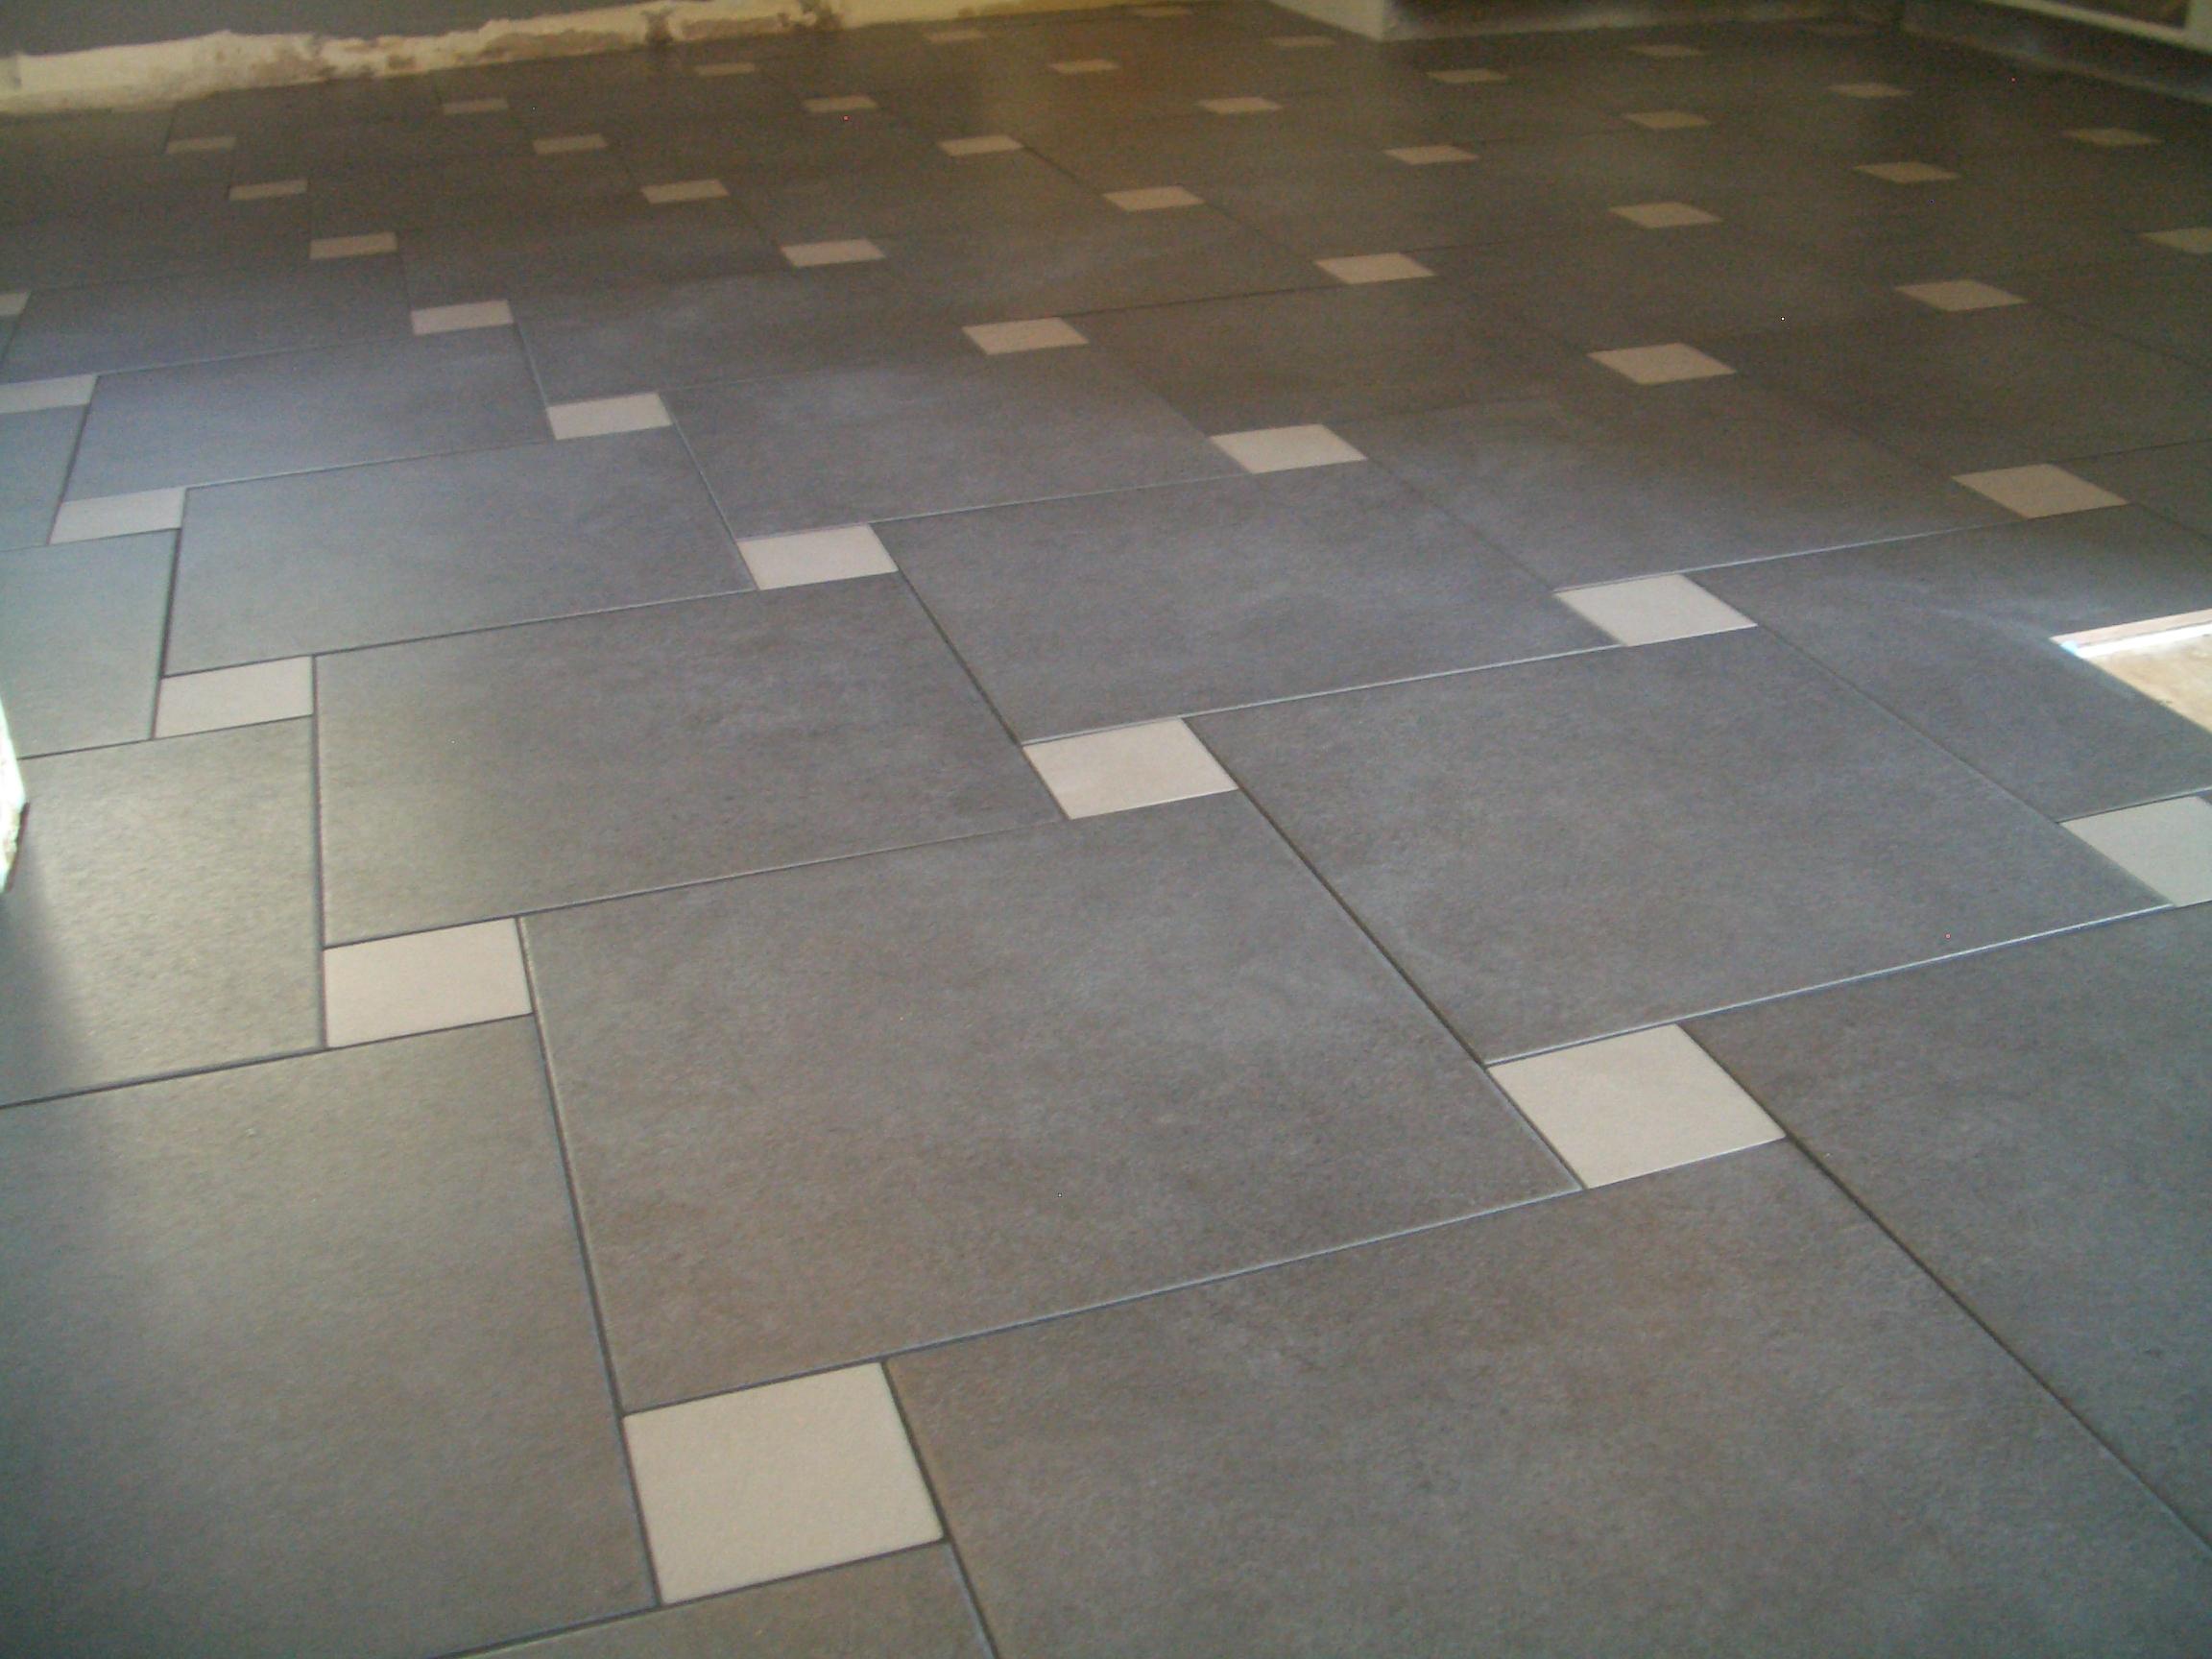 плитка на полу разных цветов